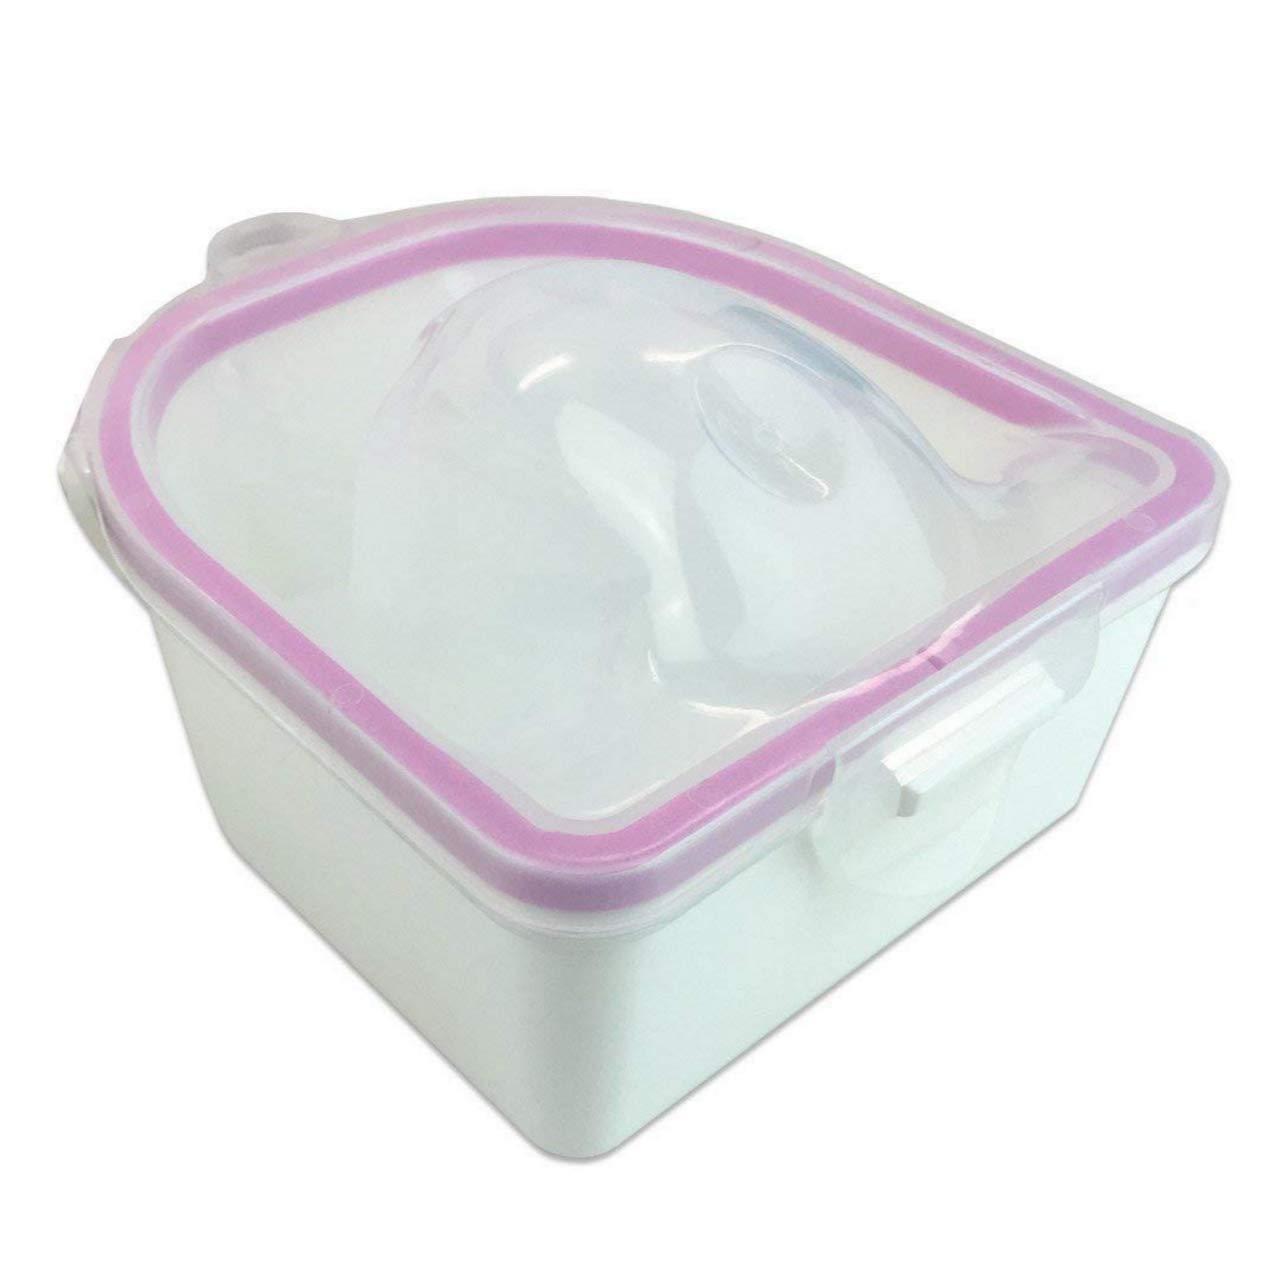 Professional Acetone Resistant Soak Off Warm Nail Spa Bowl Manicure Tool J0886-1 BeautyCenter